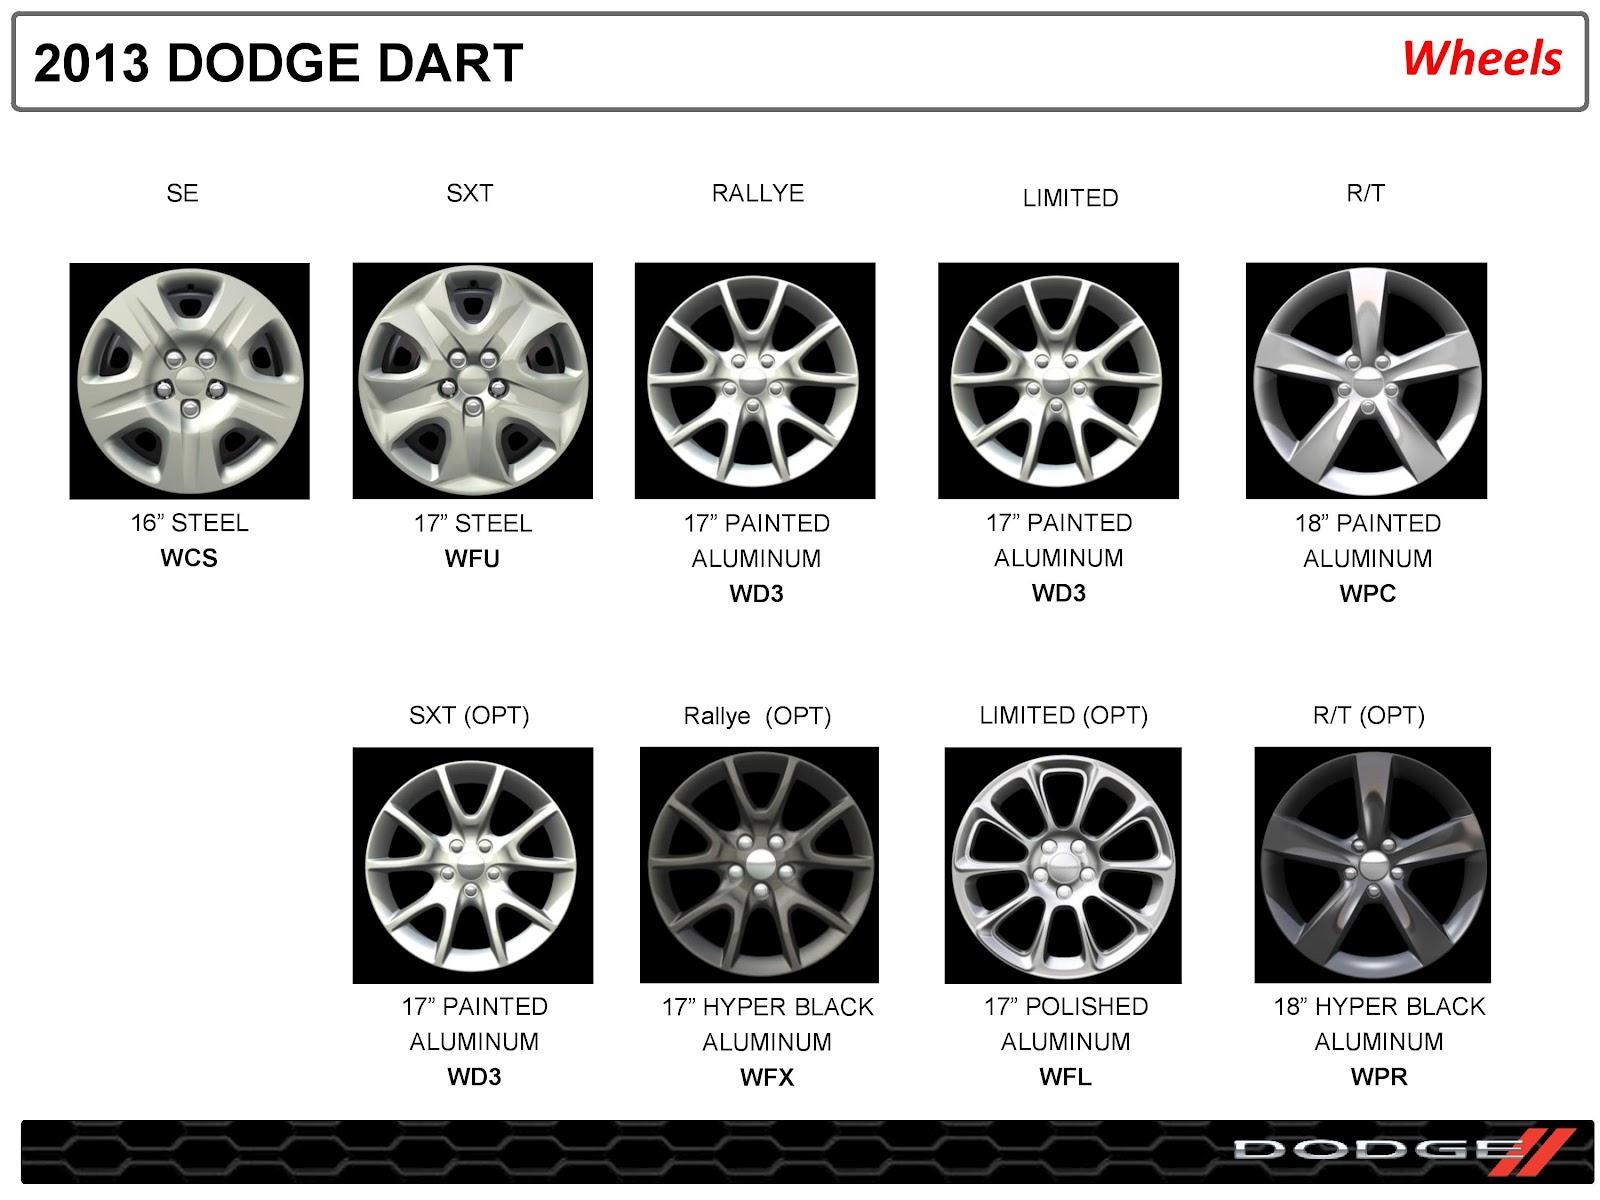 official 2013 dodge dart headquarters website  2013 dodge